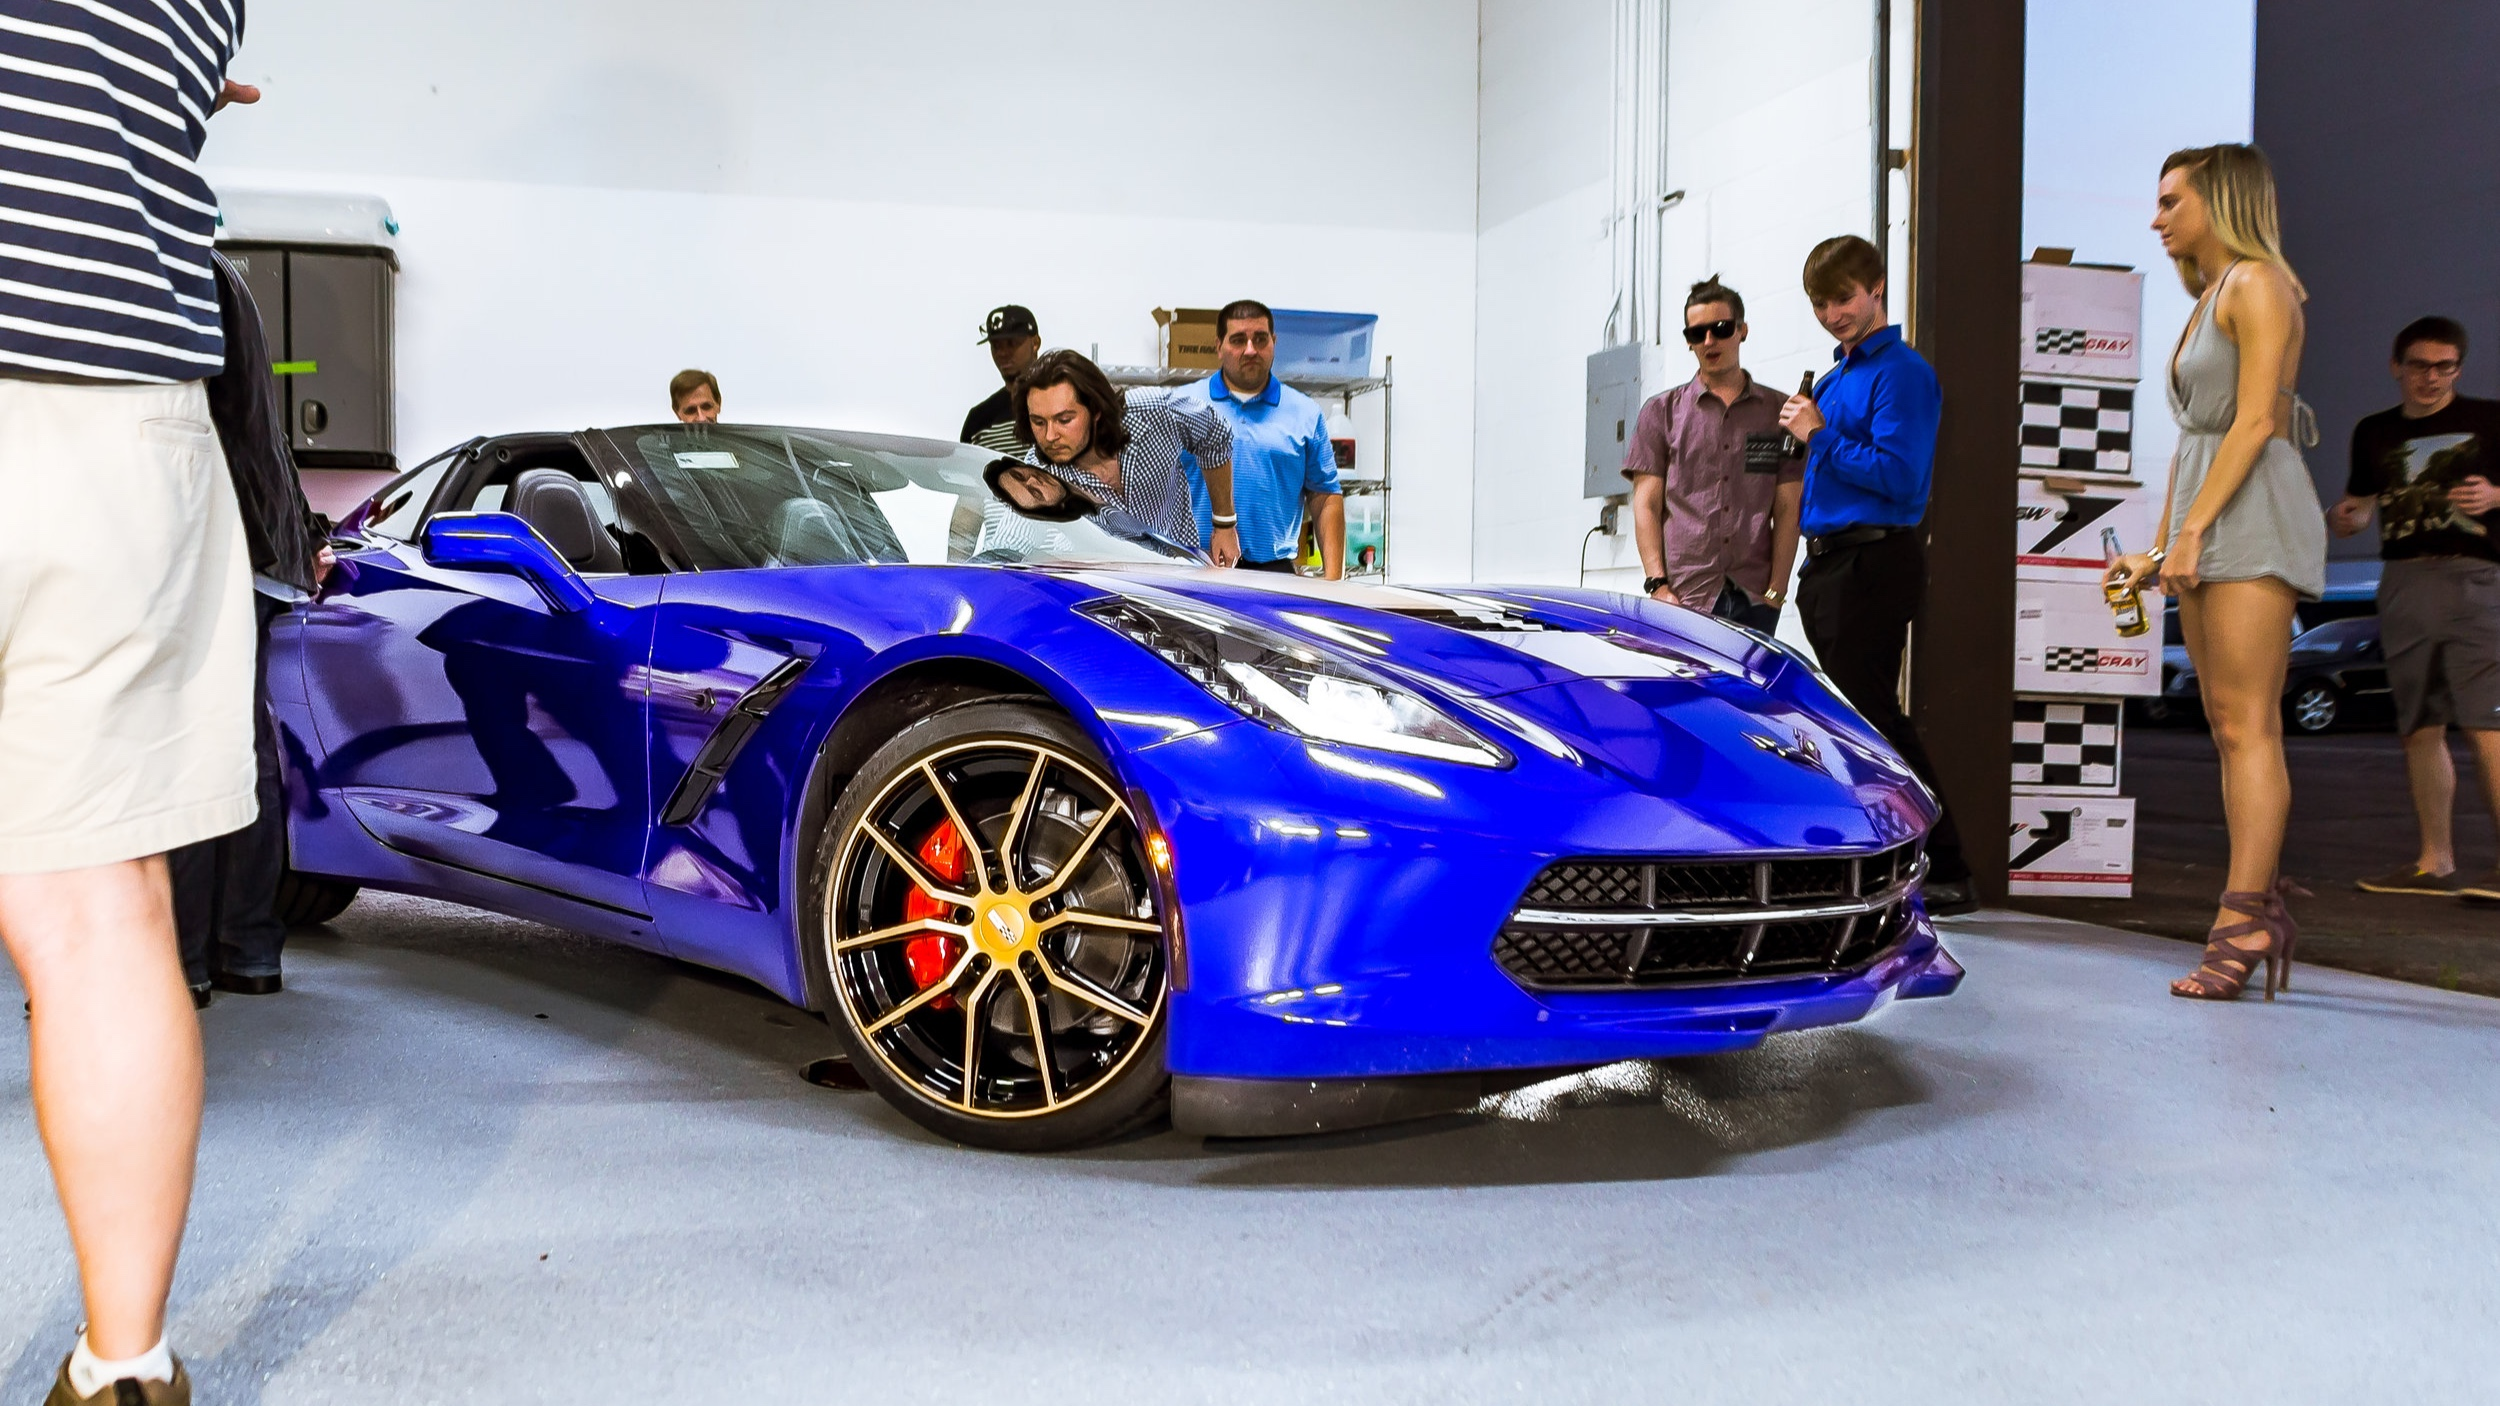 Corvette C7 Stingray - Raspberry Blue, Satin Bronze Accents, ACS Composities Aero, Cray Wheels, Corsa Exhaust